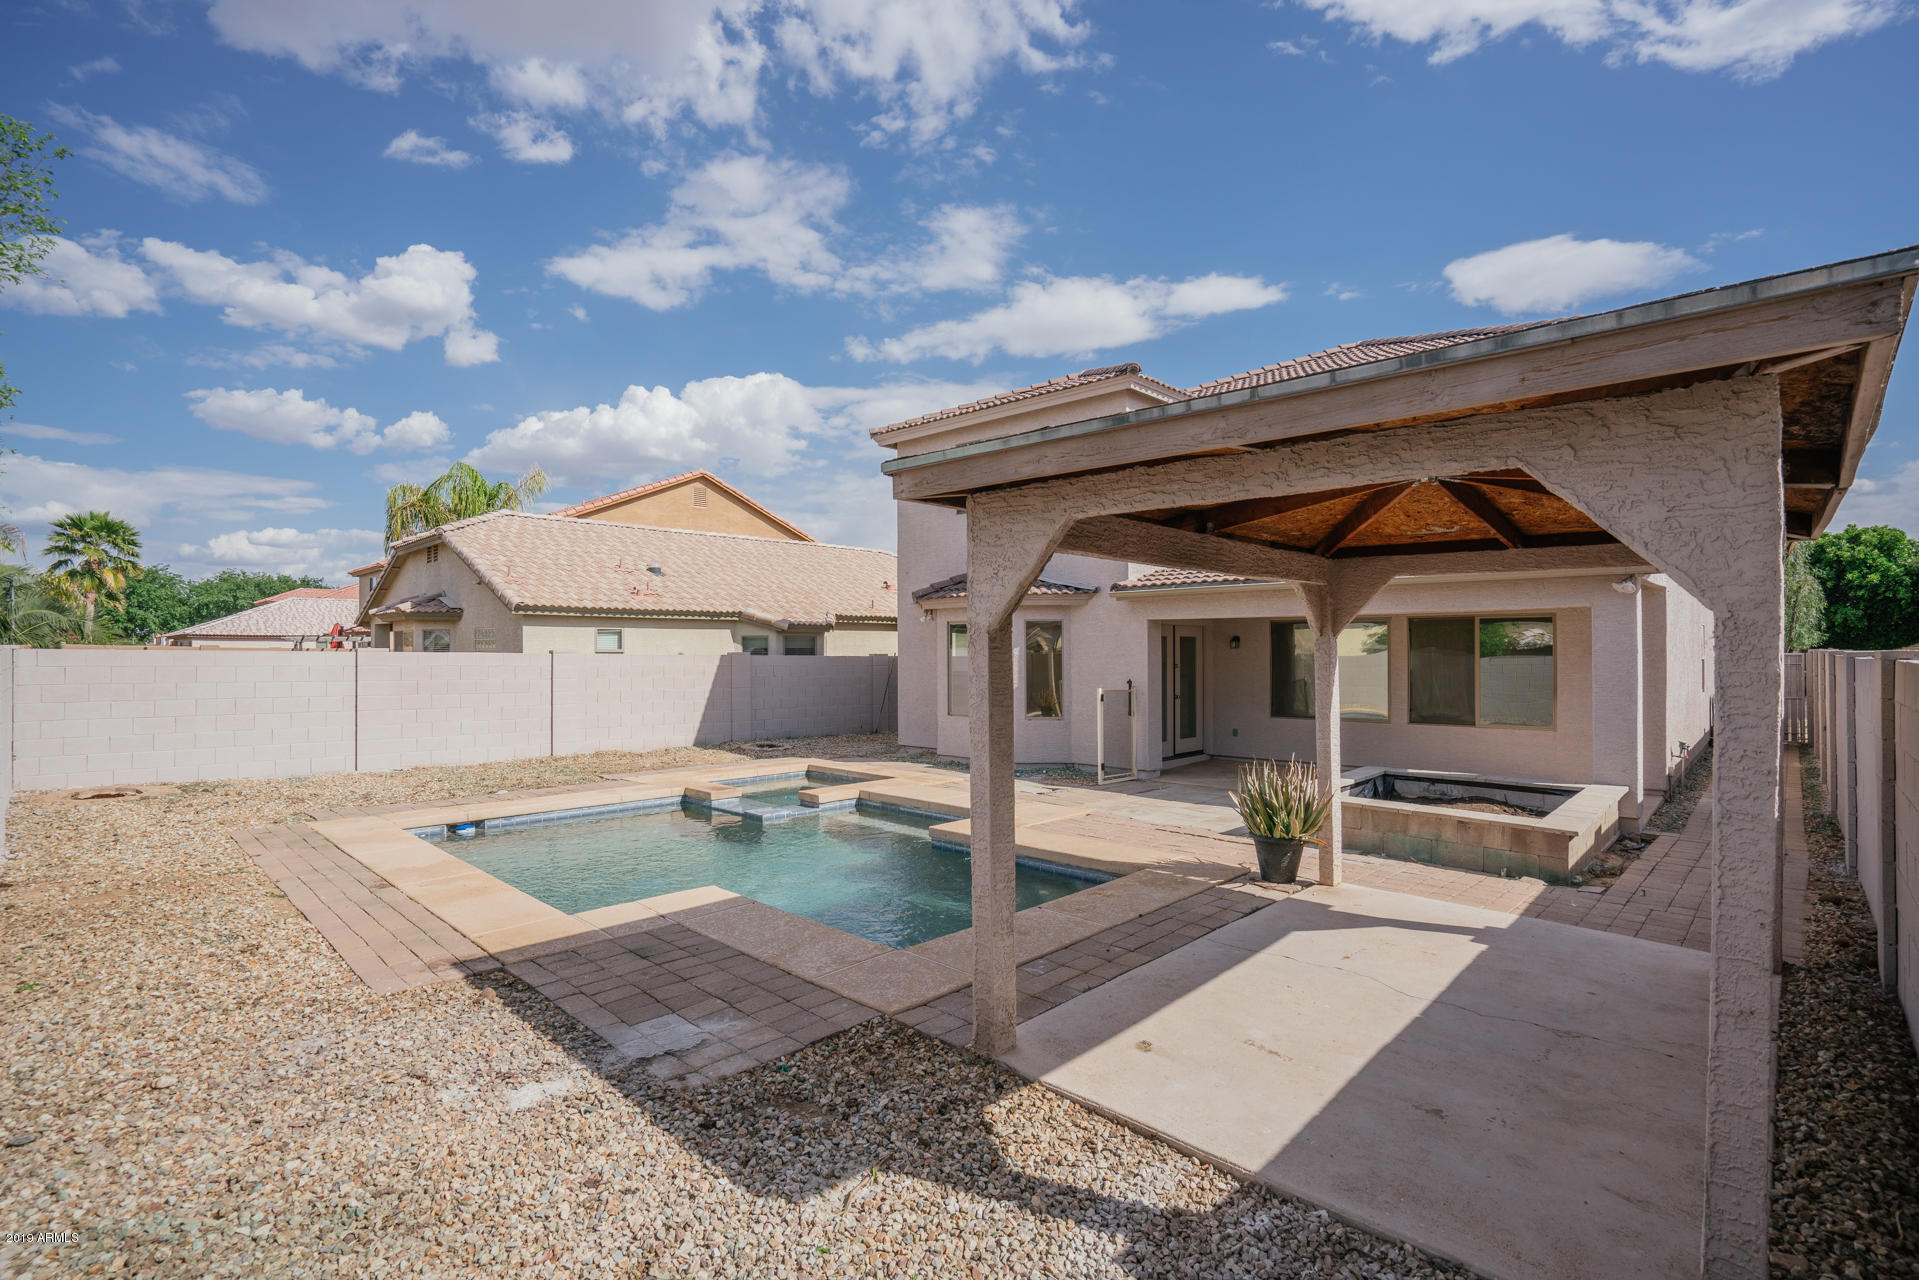 MLS 5950408 10522 W EDGEMONT Drive, Avondale, AZ 85392 Avondale AZ Three Bedroom